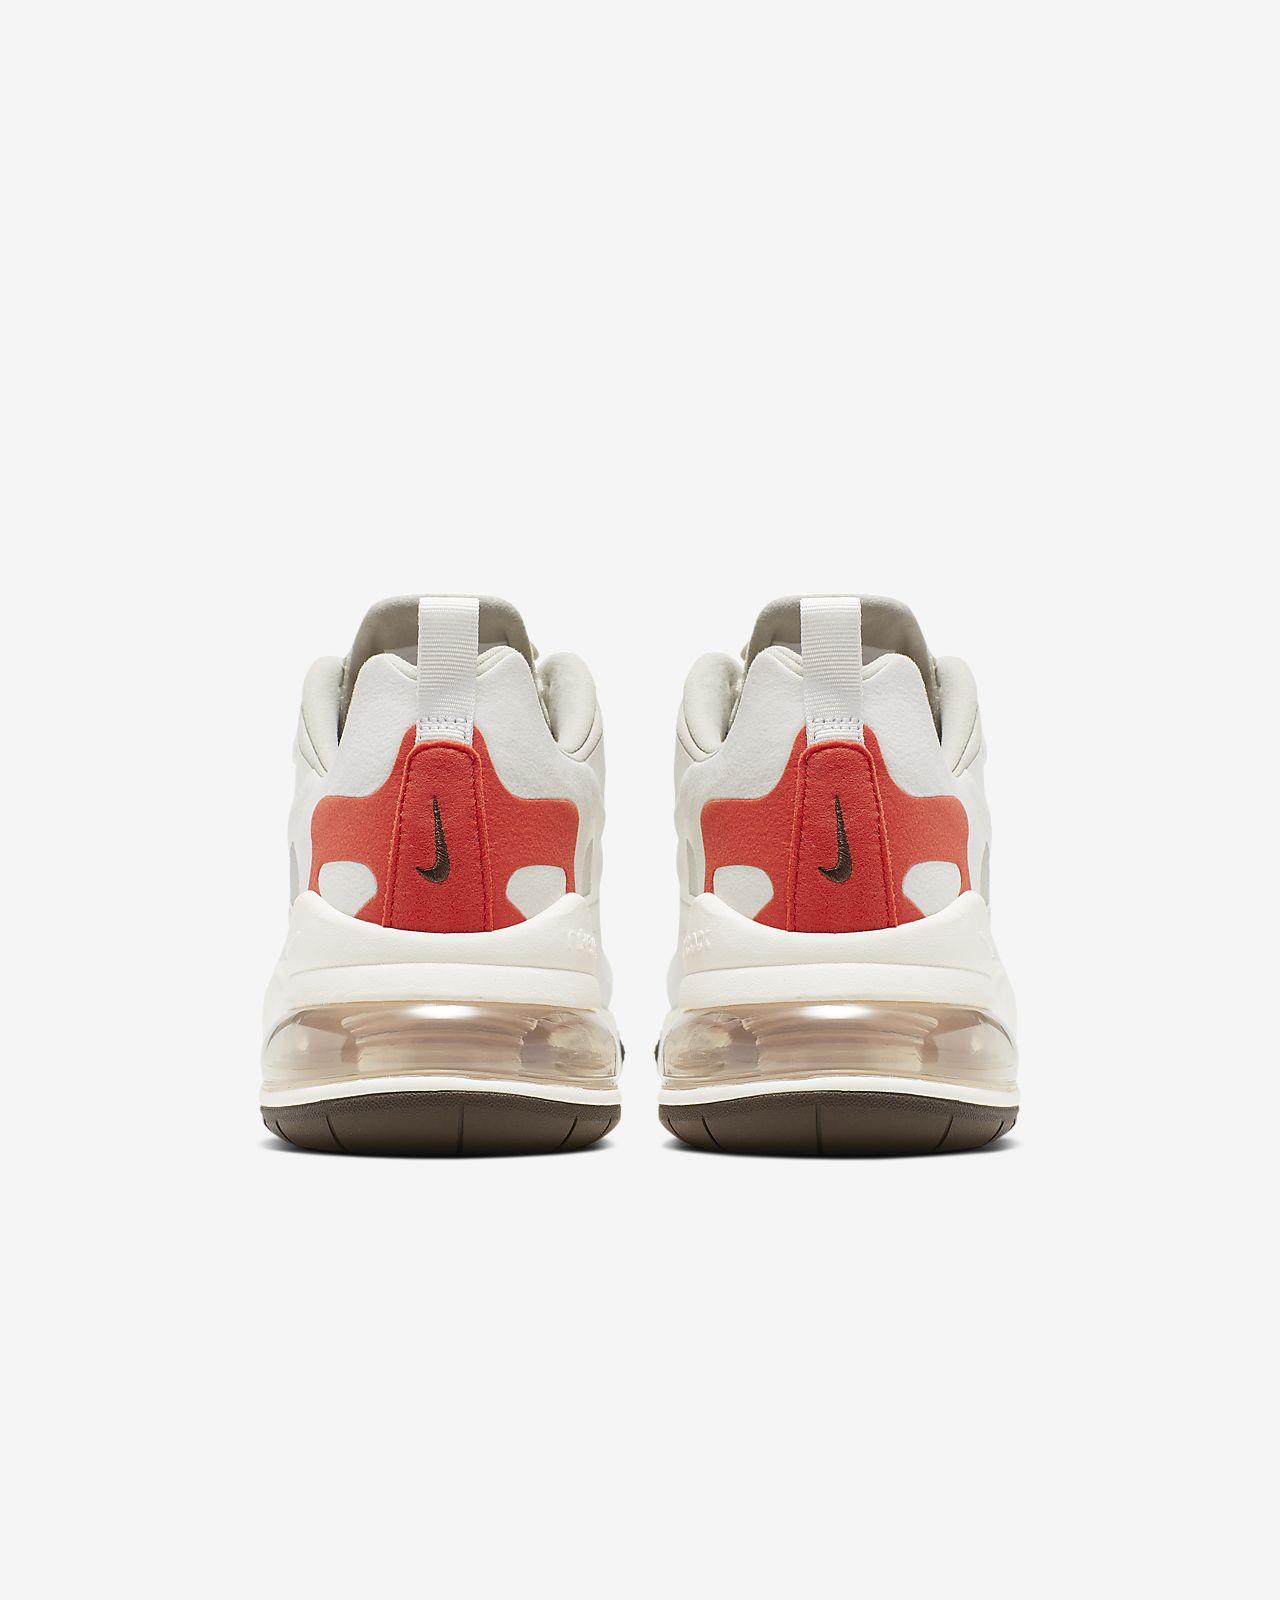 NIKE Air Max 720 Be True Sneakers Bunt Herren Schuhe